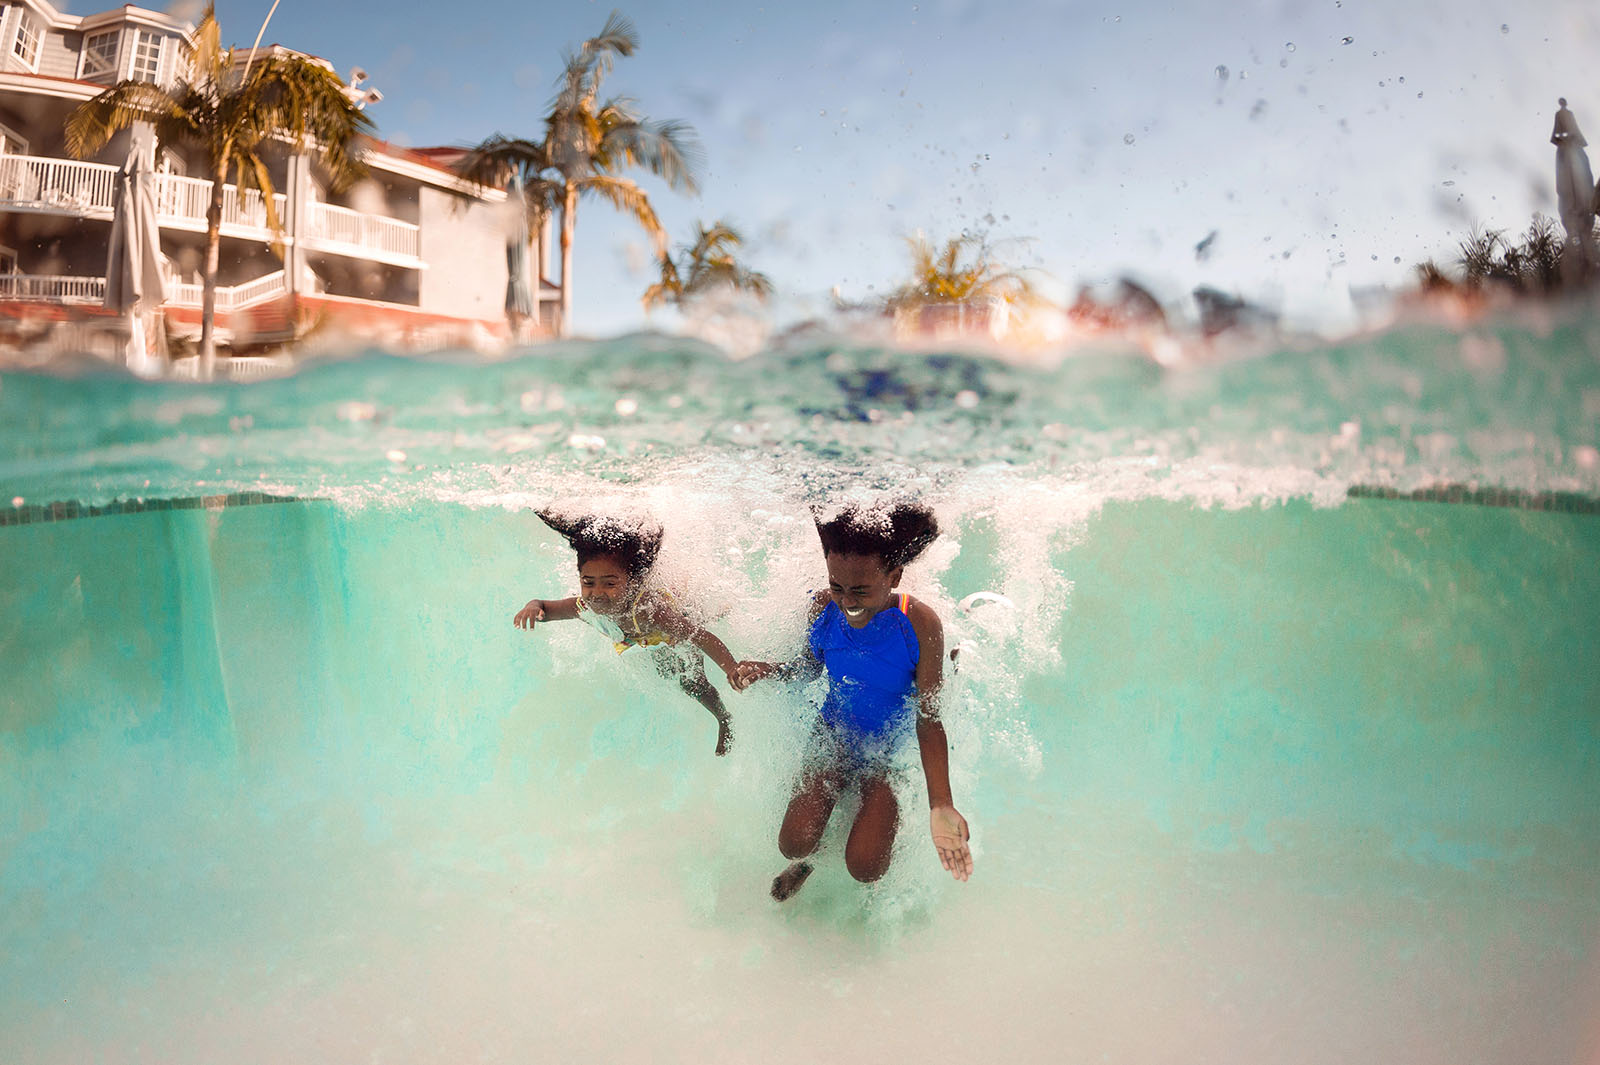 Elizabeth-blank-underwater-photography-04.jpg